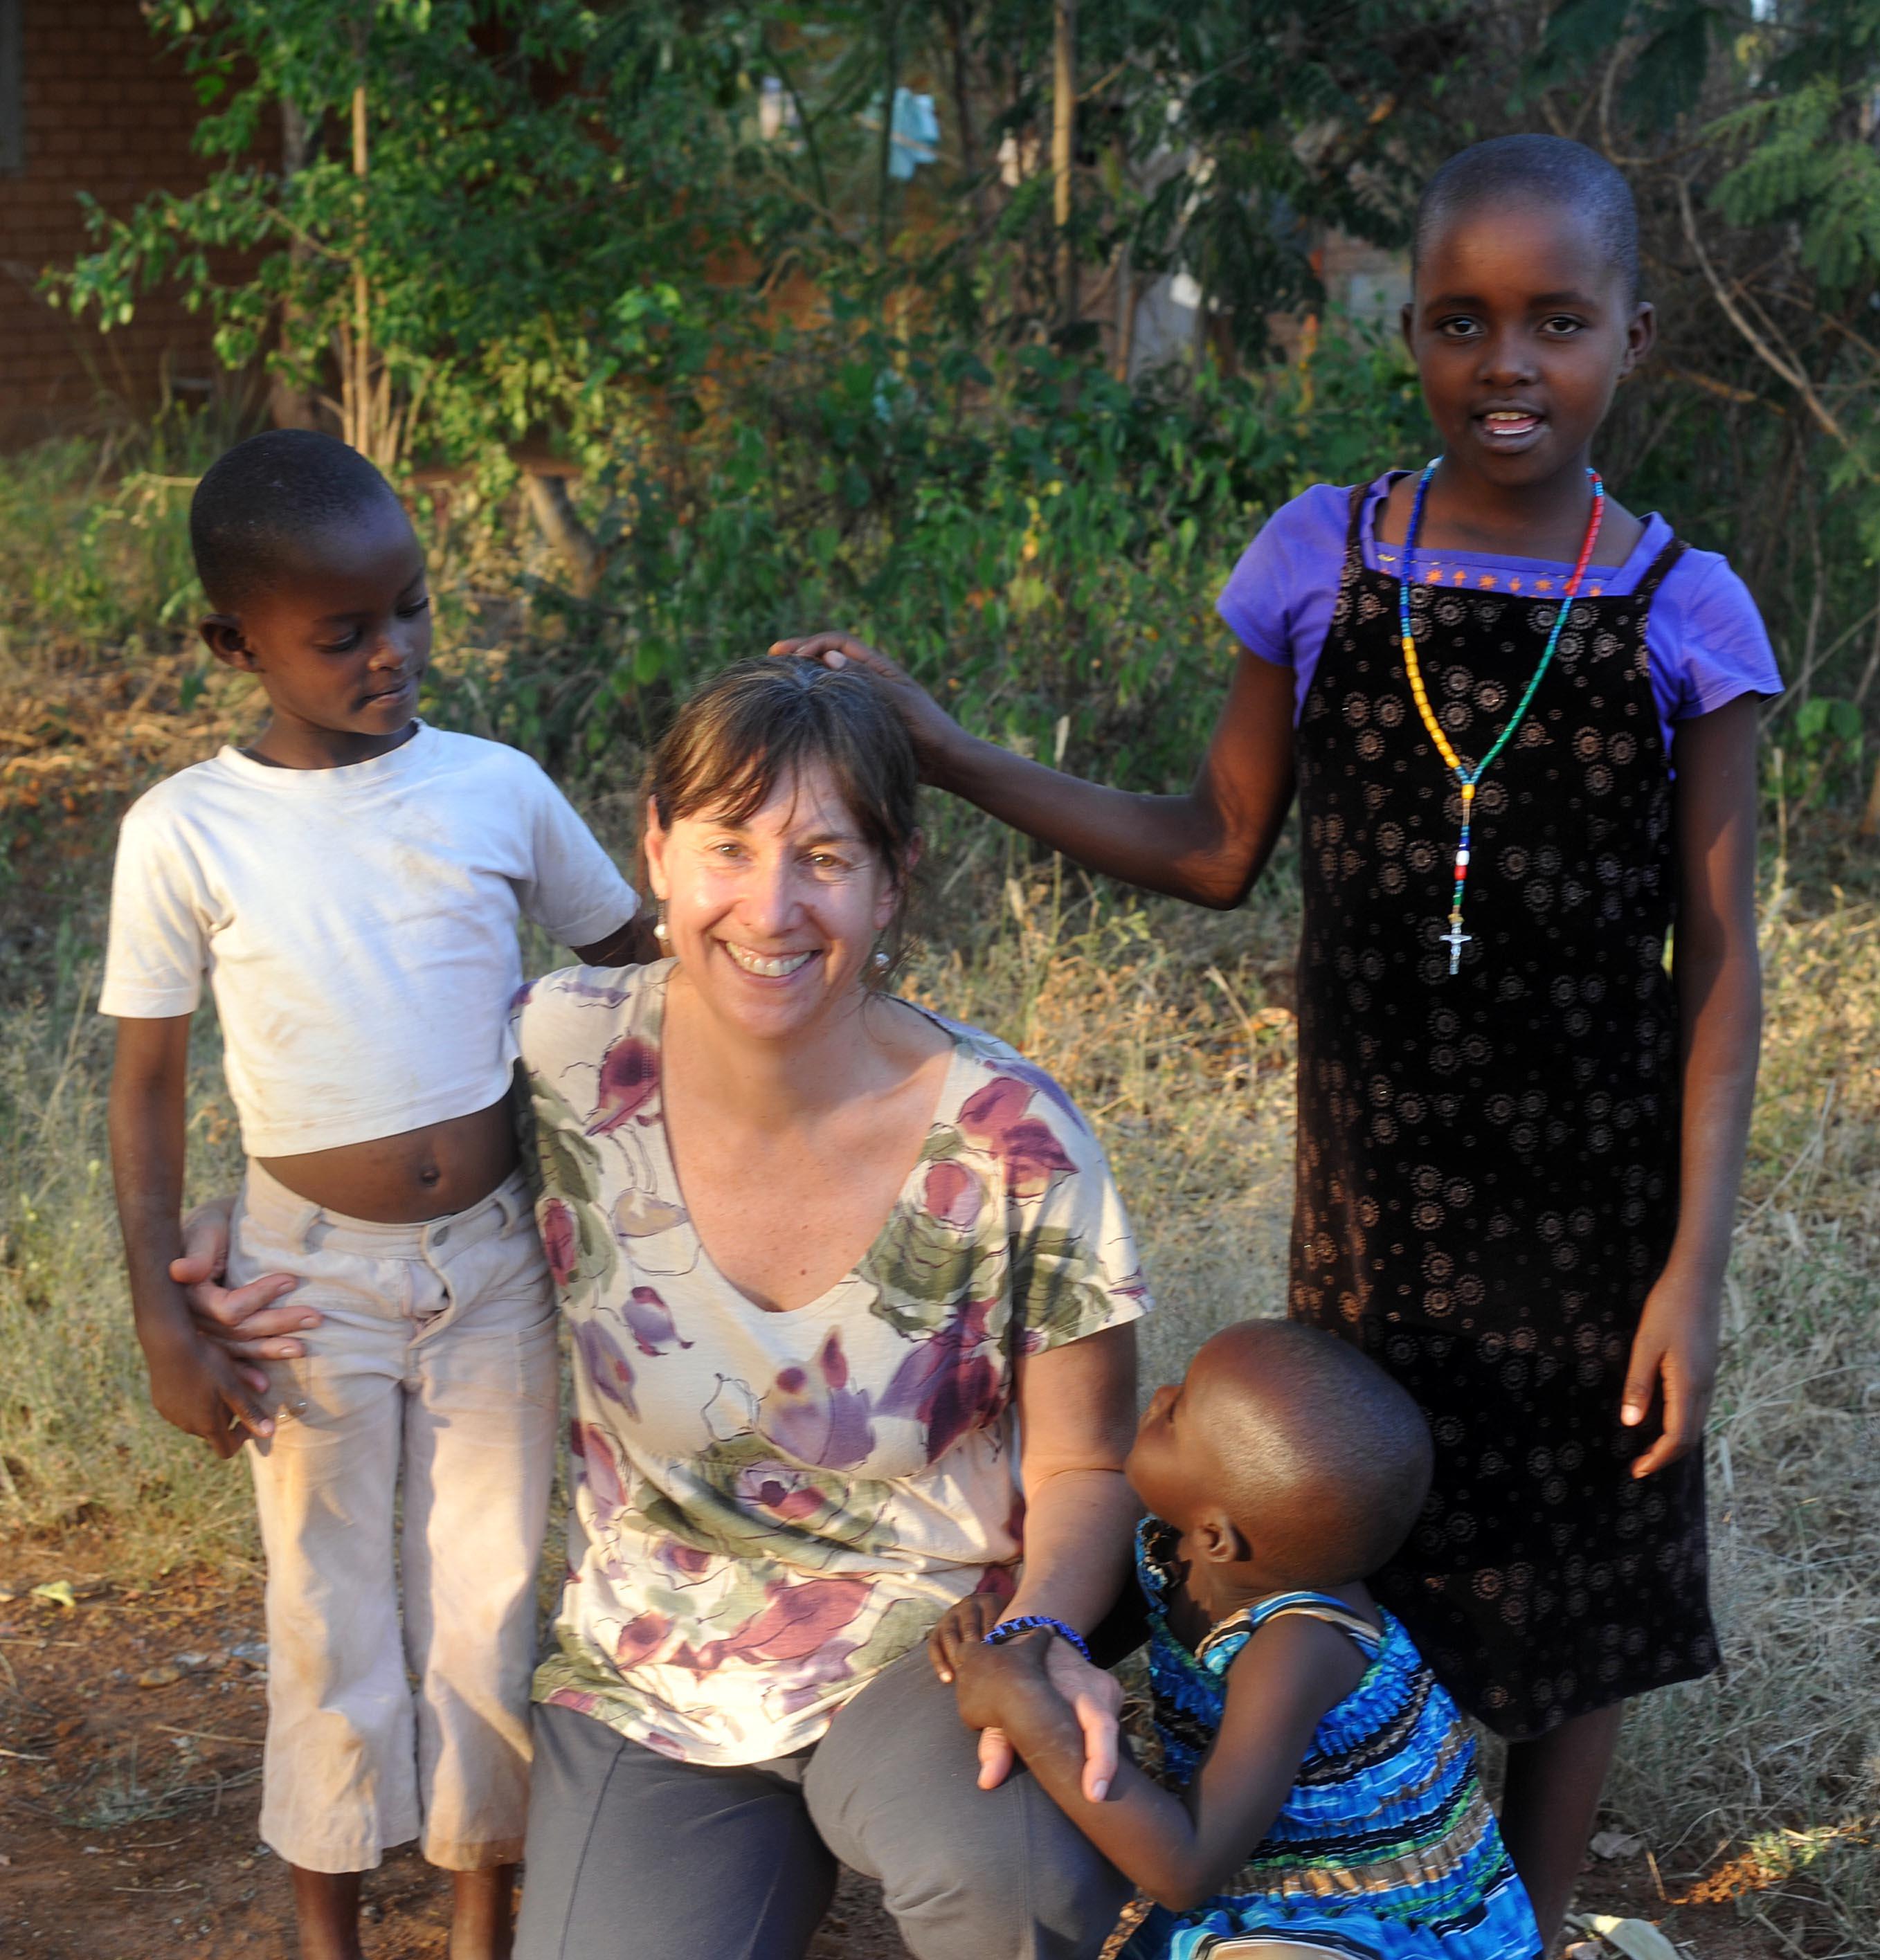 Deb with the neighbor children